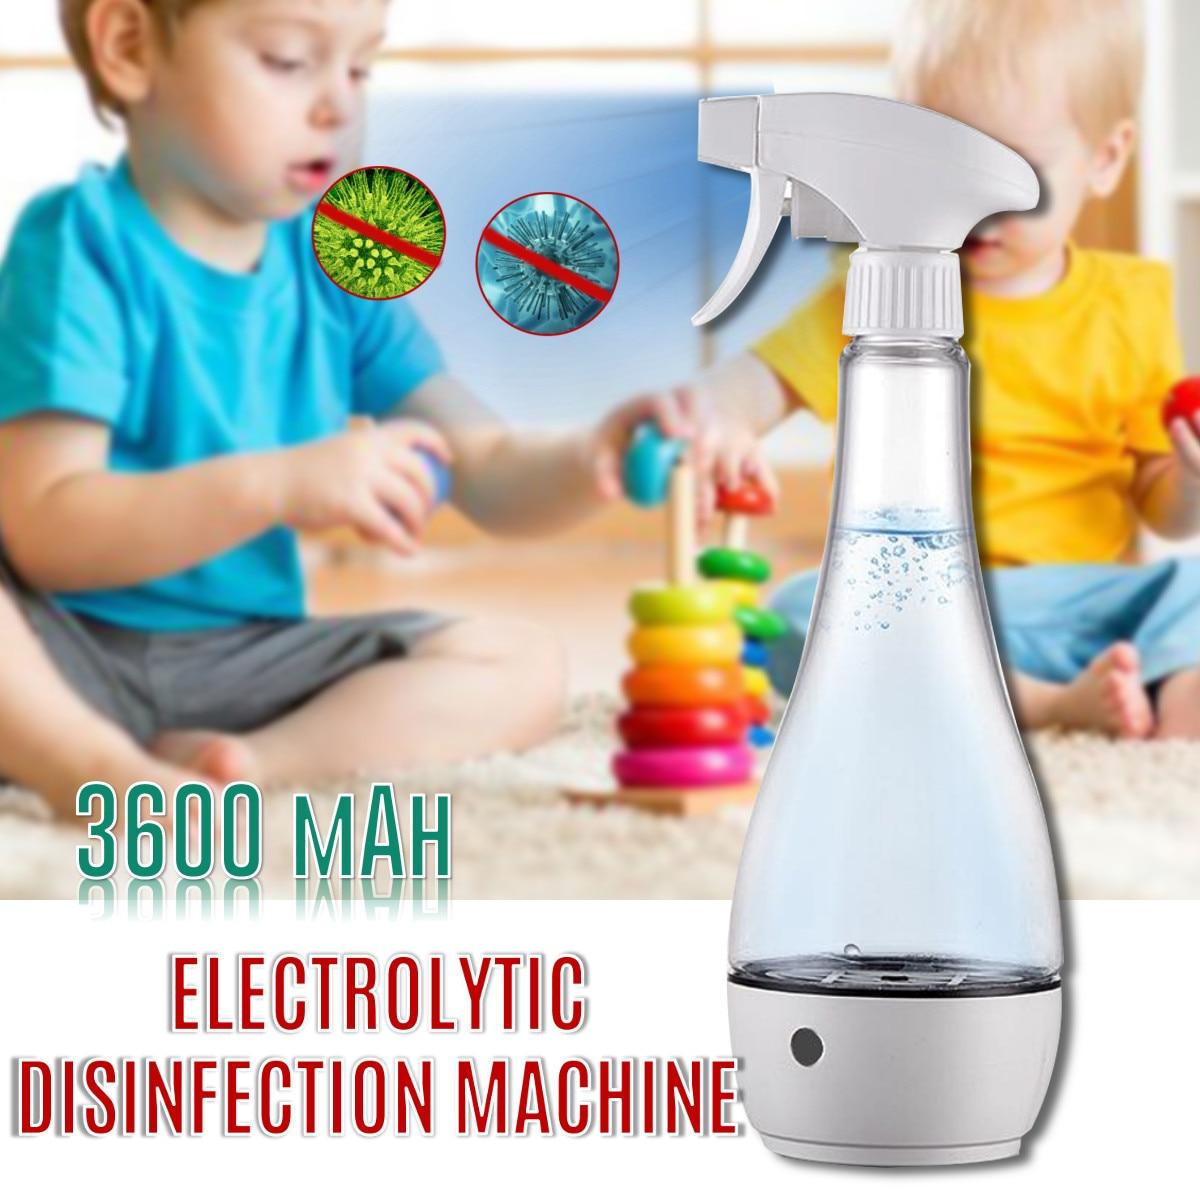 84 Disinfection Water Electrolytic Generator Sodium Hypochlorite Making Machine Protable Home Clean Sterilization Air Sprayer